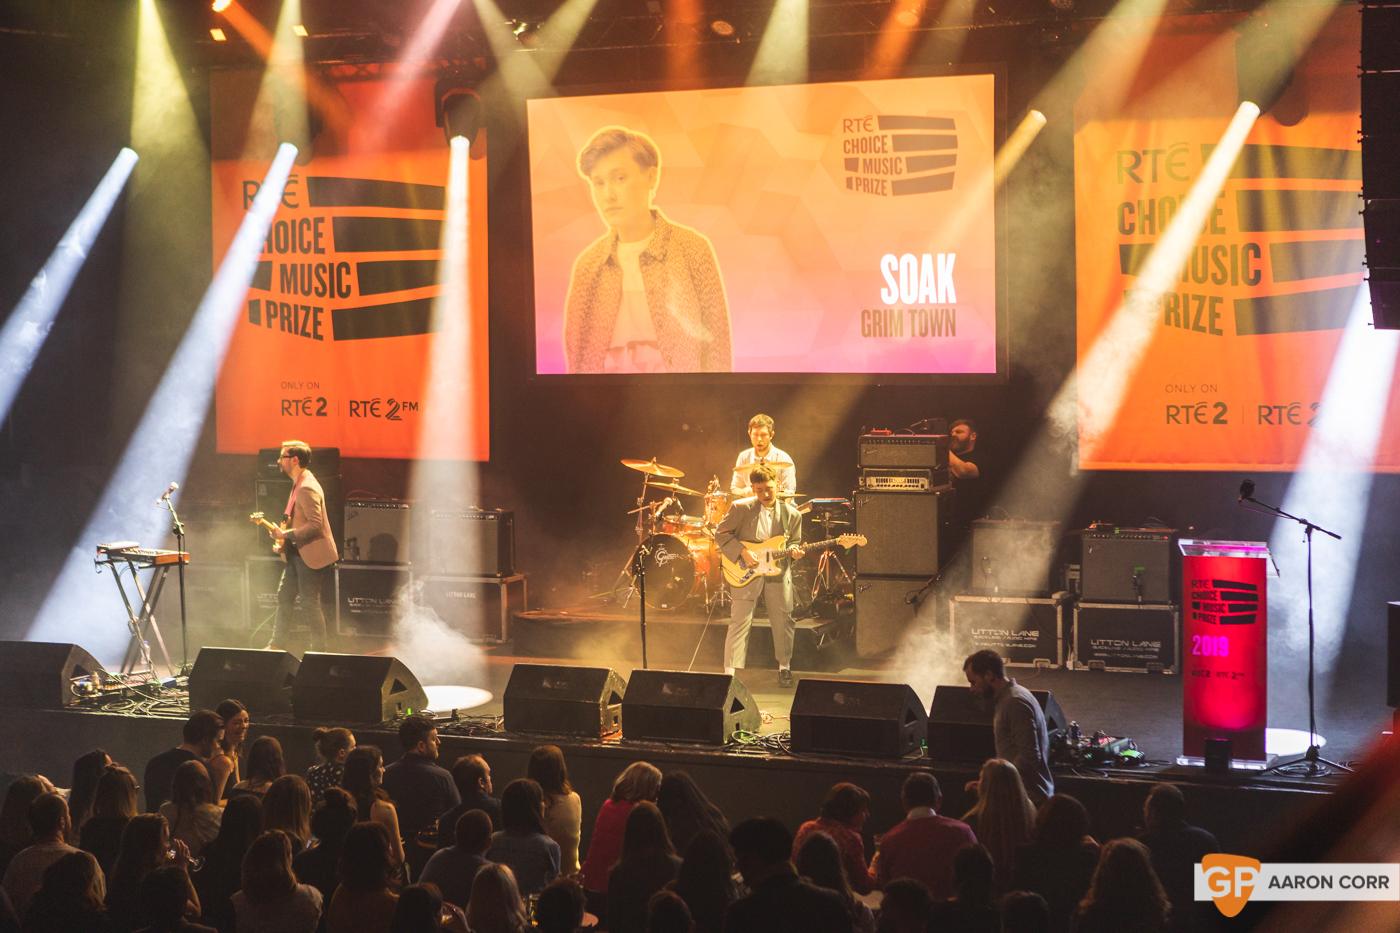 Soak at Choice Music Prize 2020 in Vicar Street, Dublin on 05-Mar-20 by Aaron Corr-2520